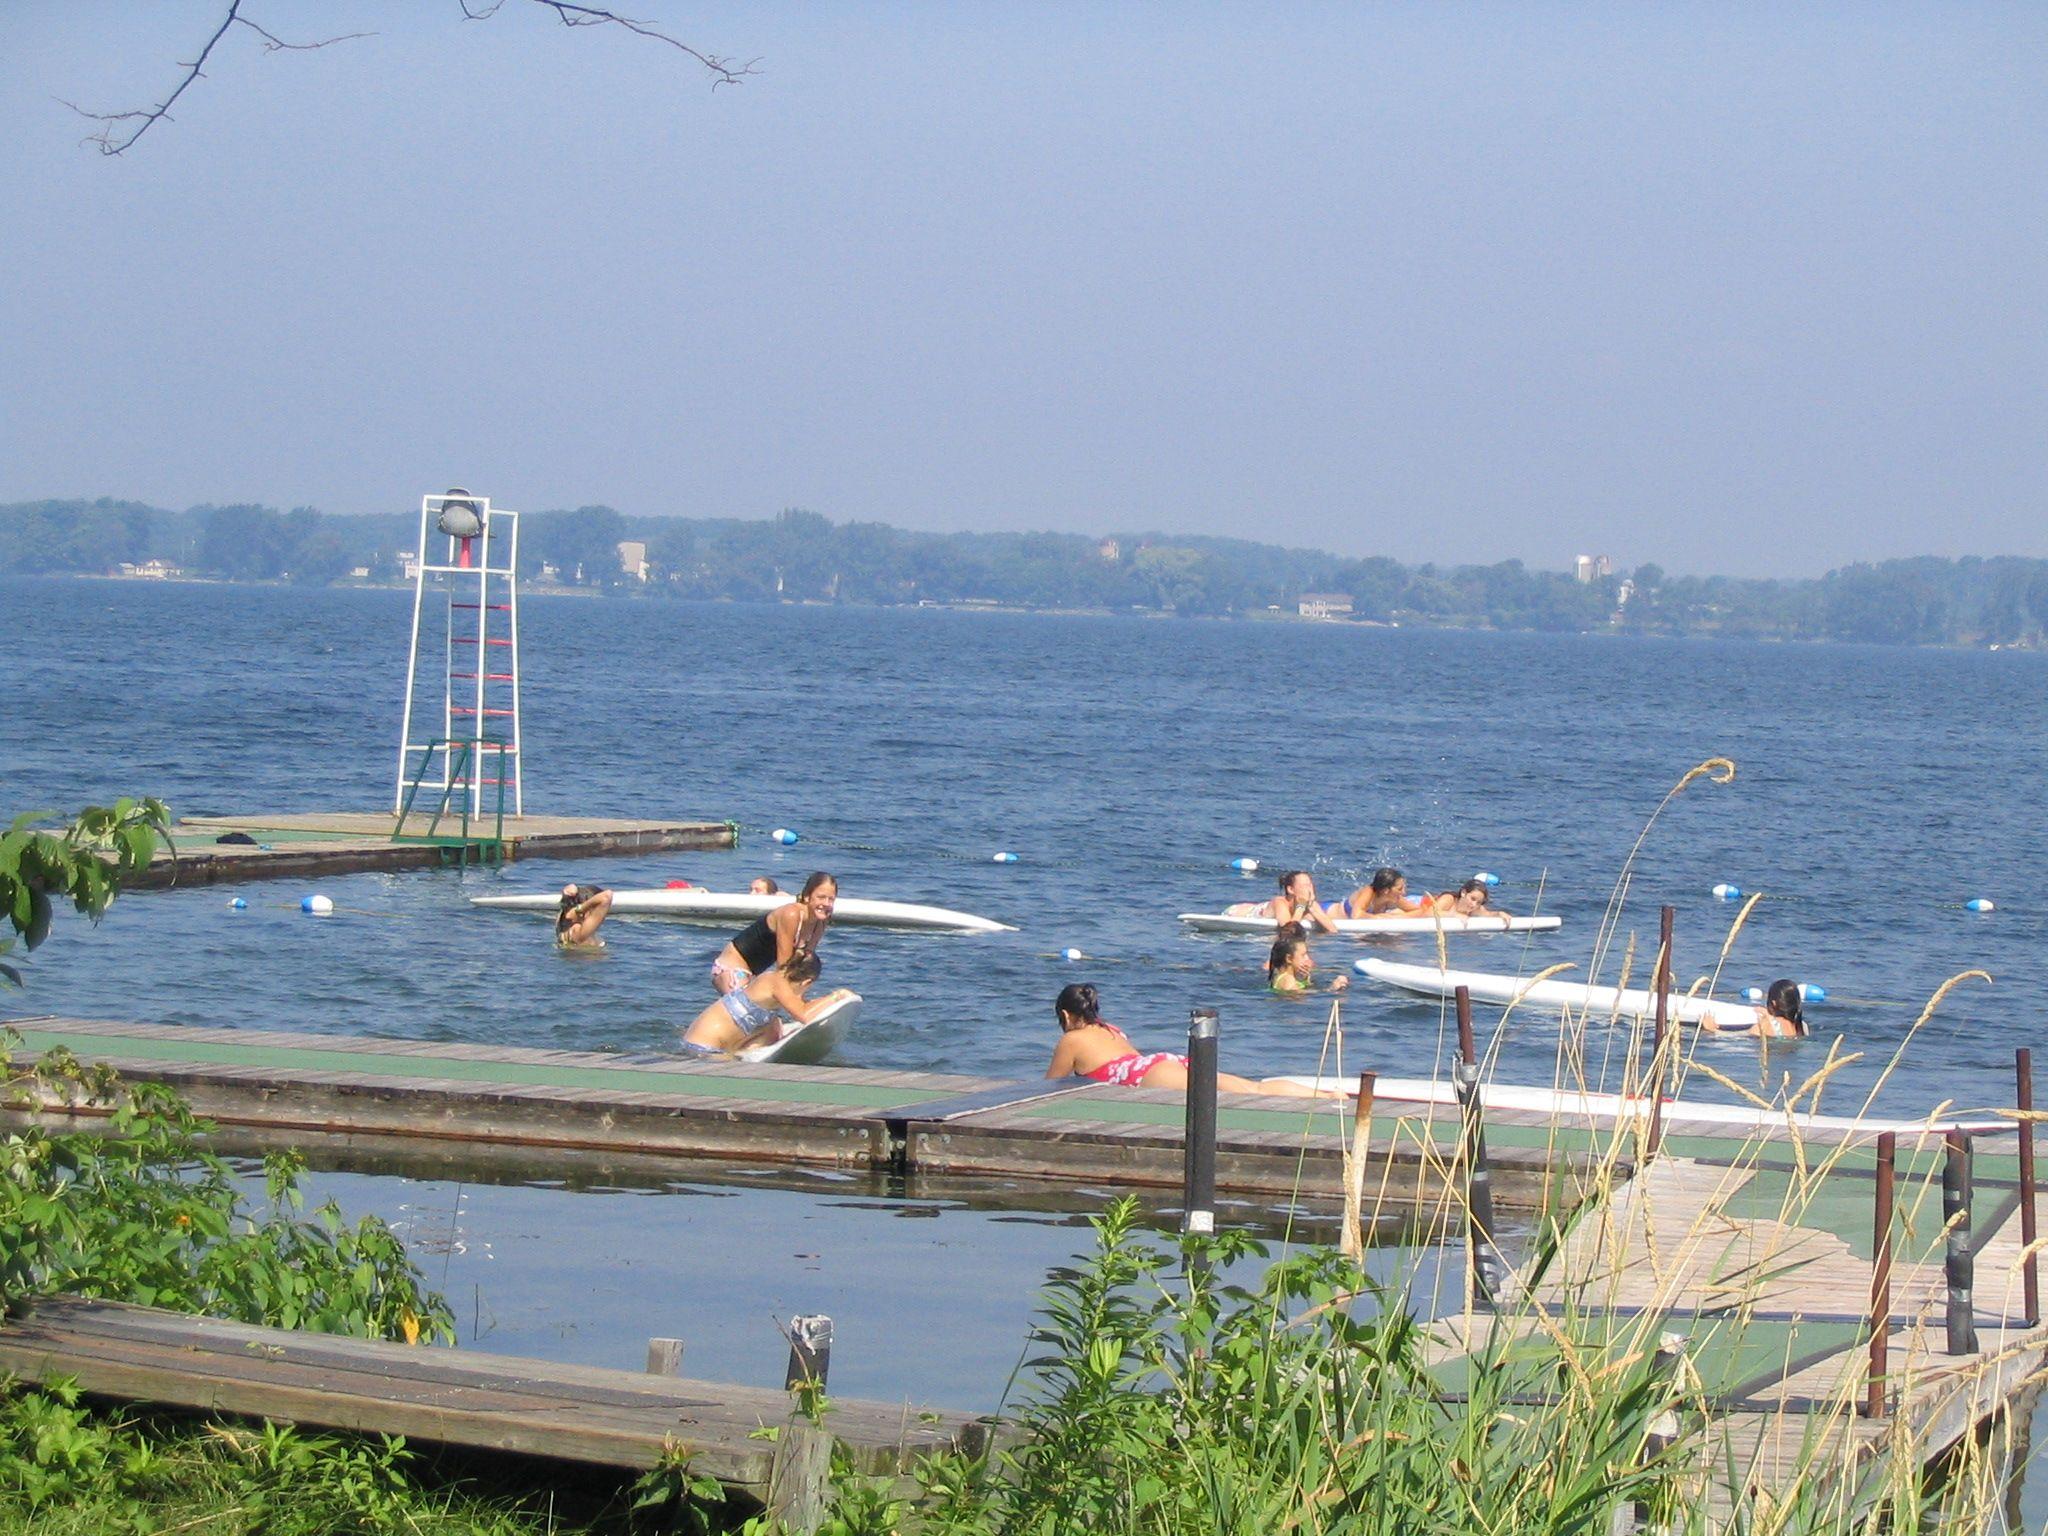 Camp trillium our island swimming area photo tour